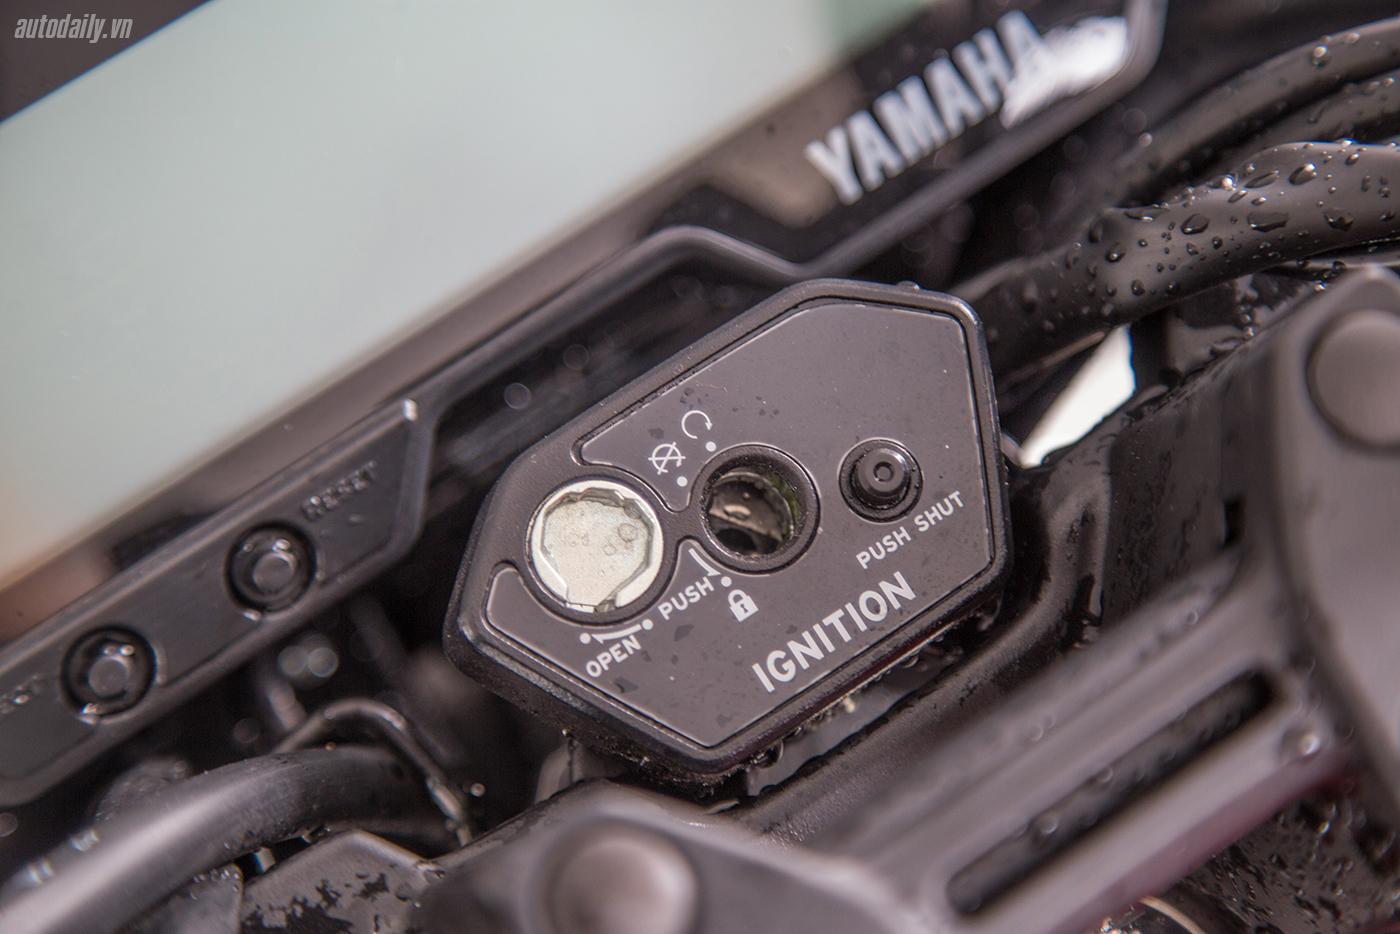 yamaha-fz-150i-2017-5.jpg